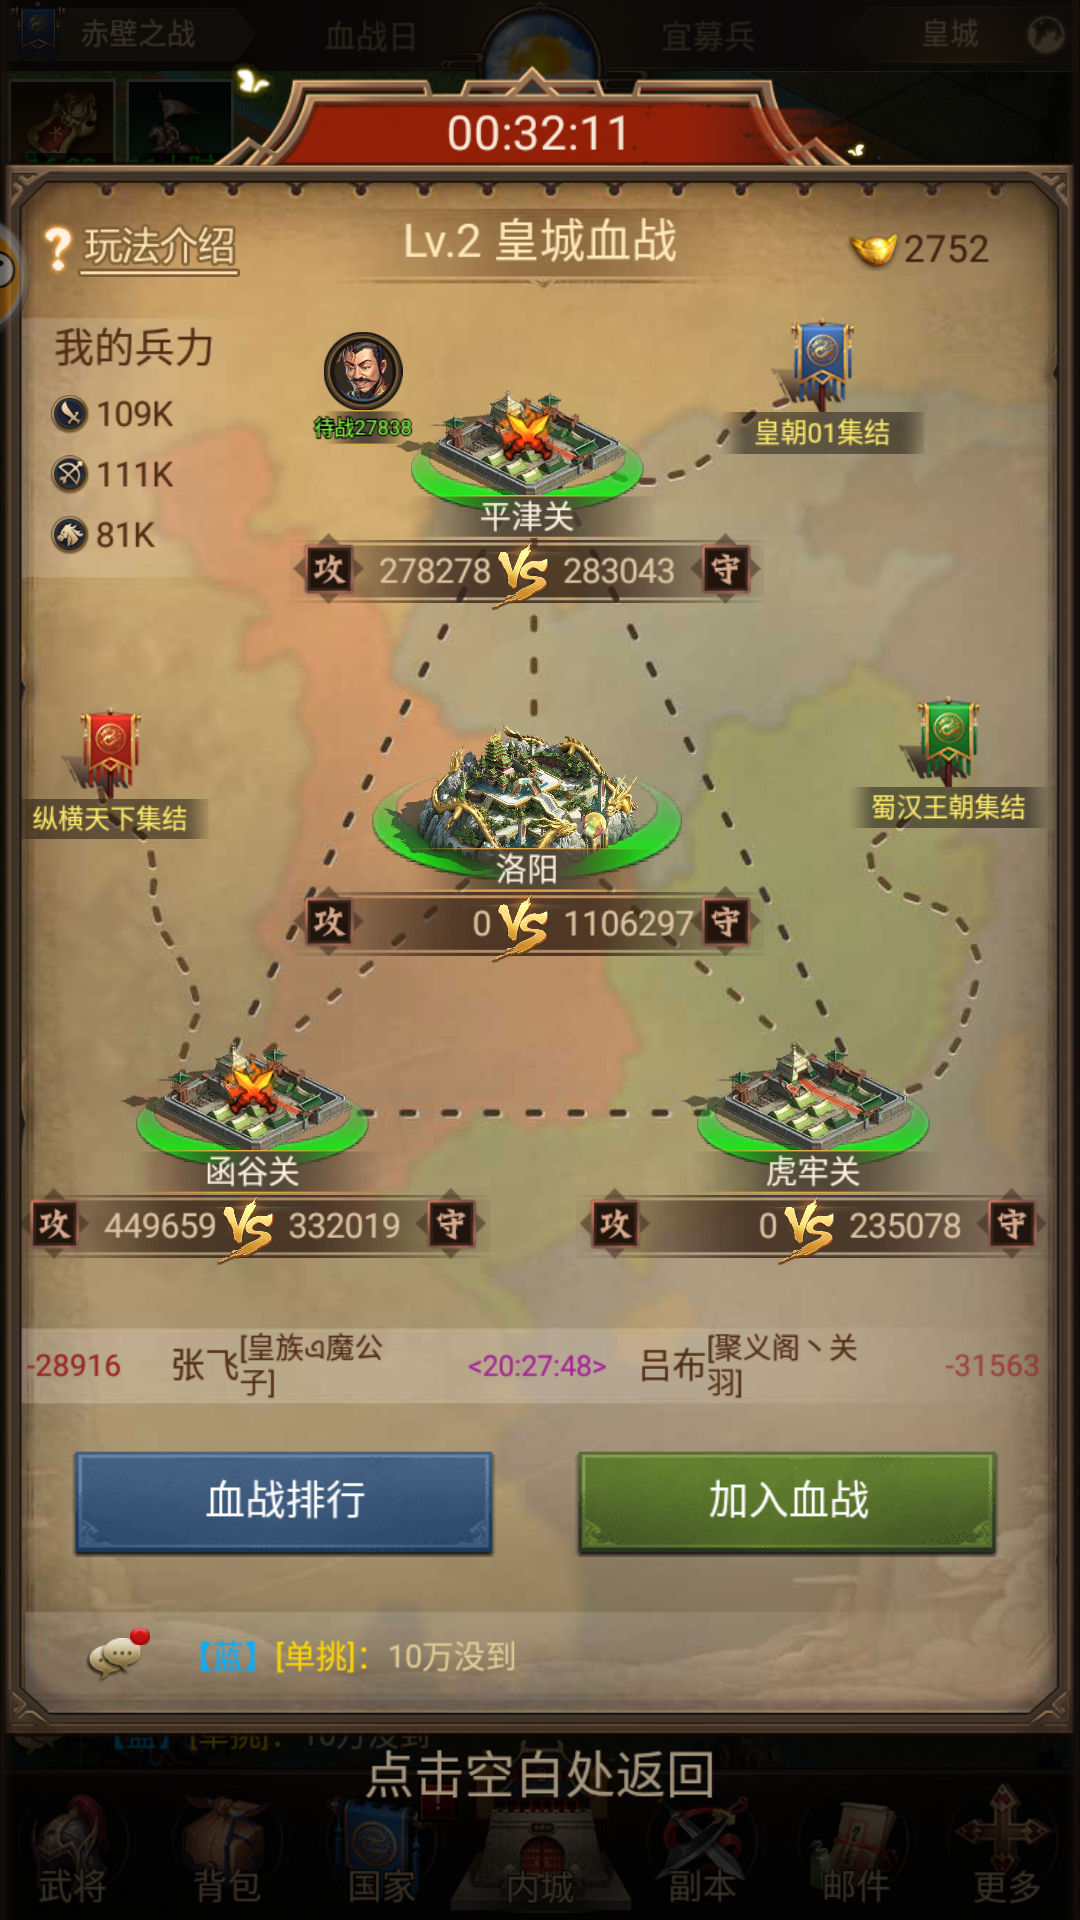 Screenshot_2019-08-02-20-27-50-907_com.juedigame.sgdjl.shoumeng.png